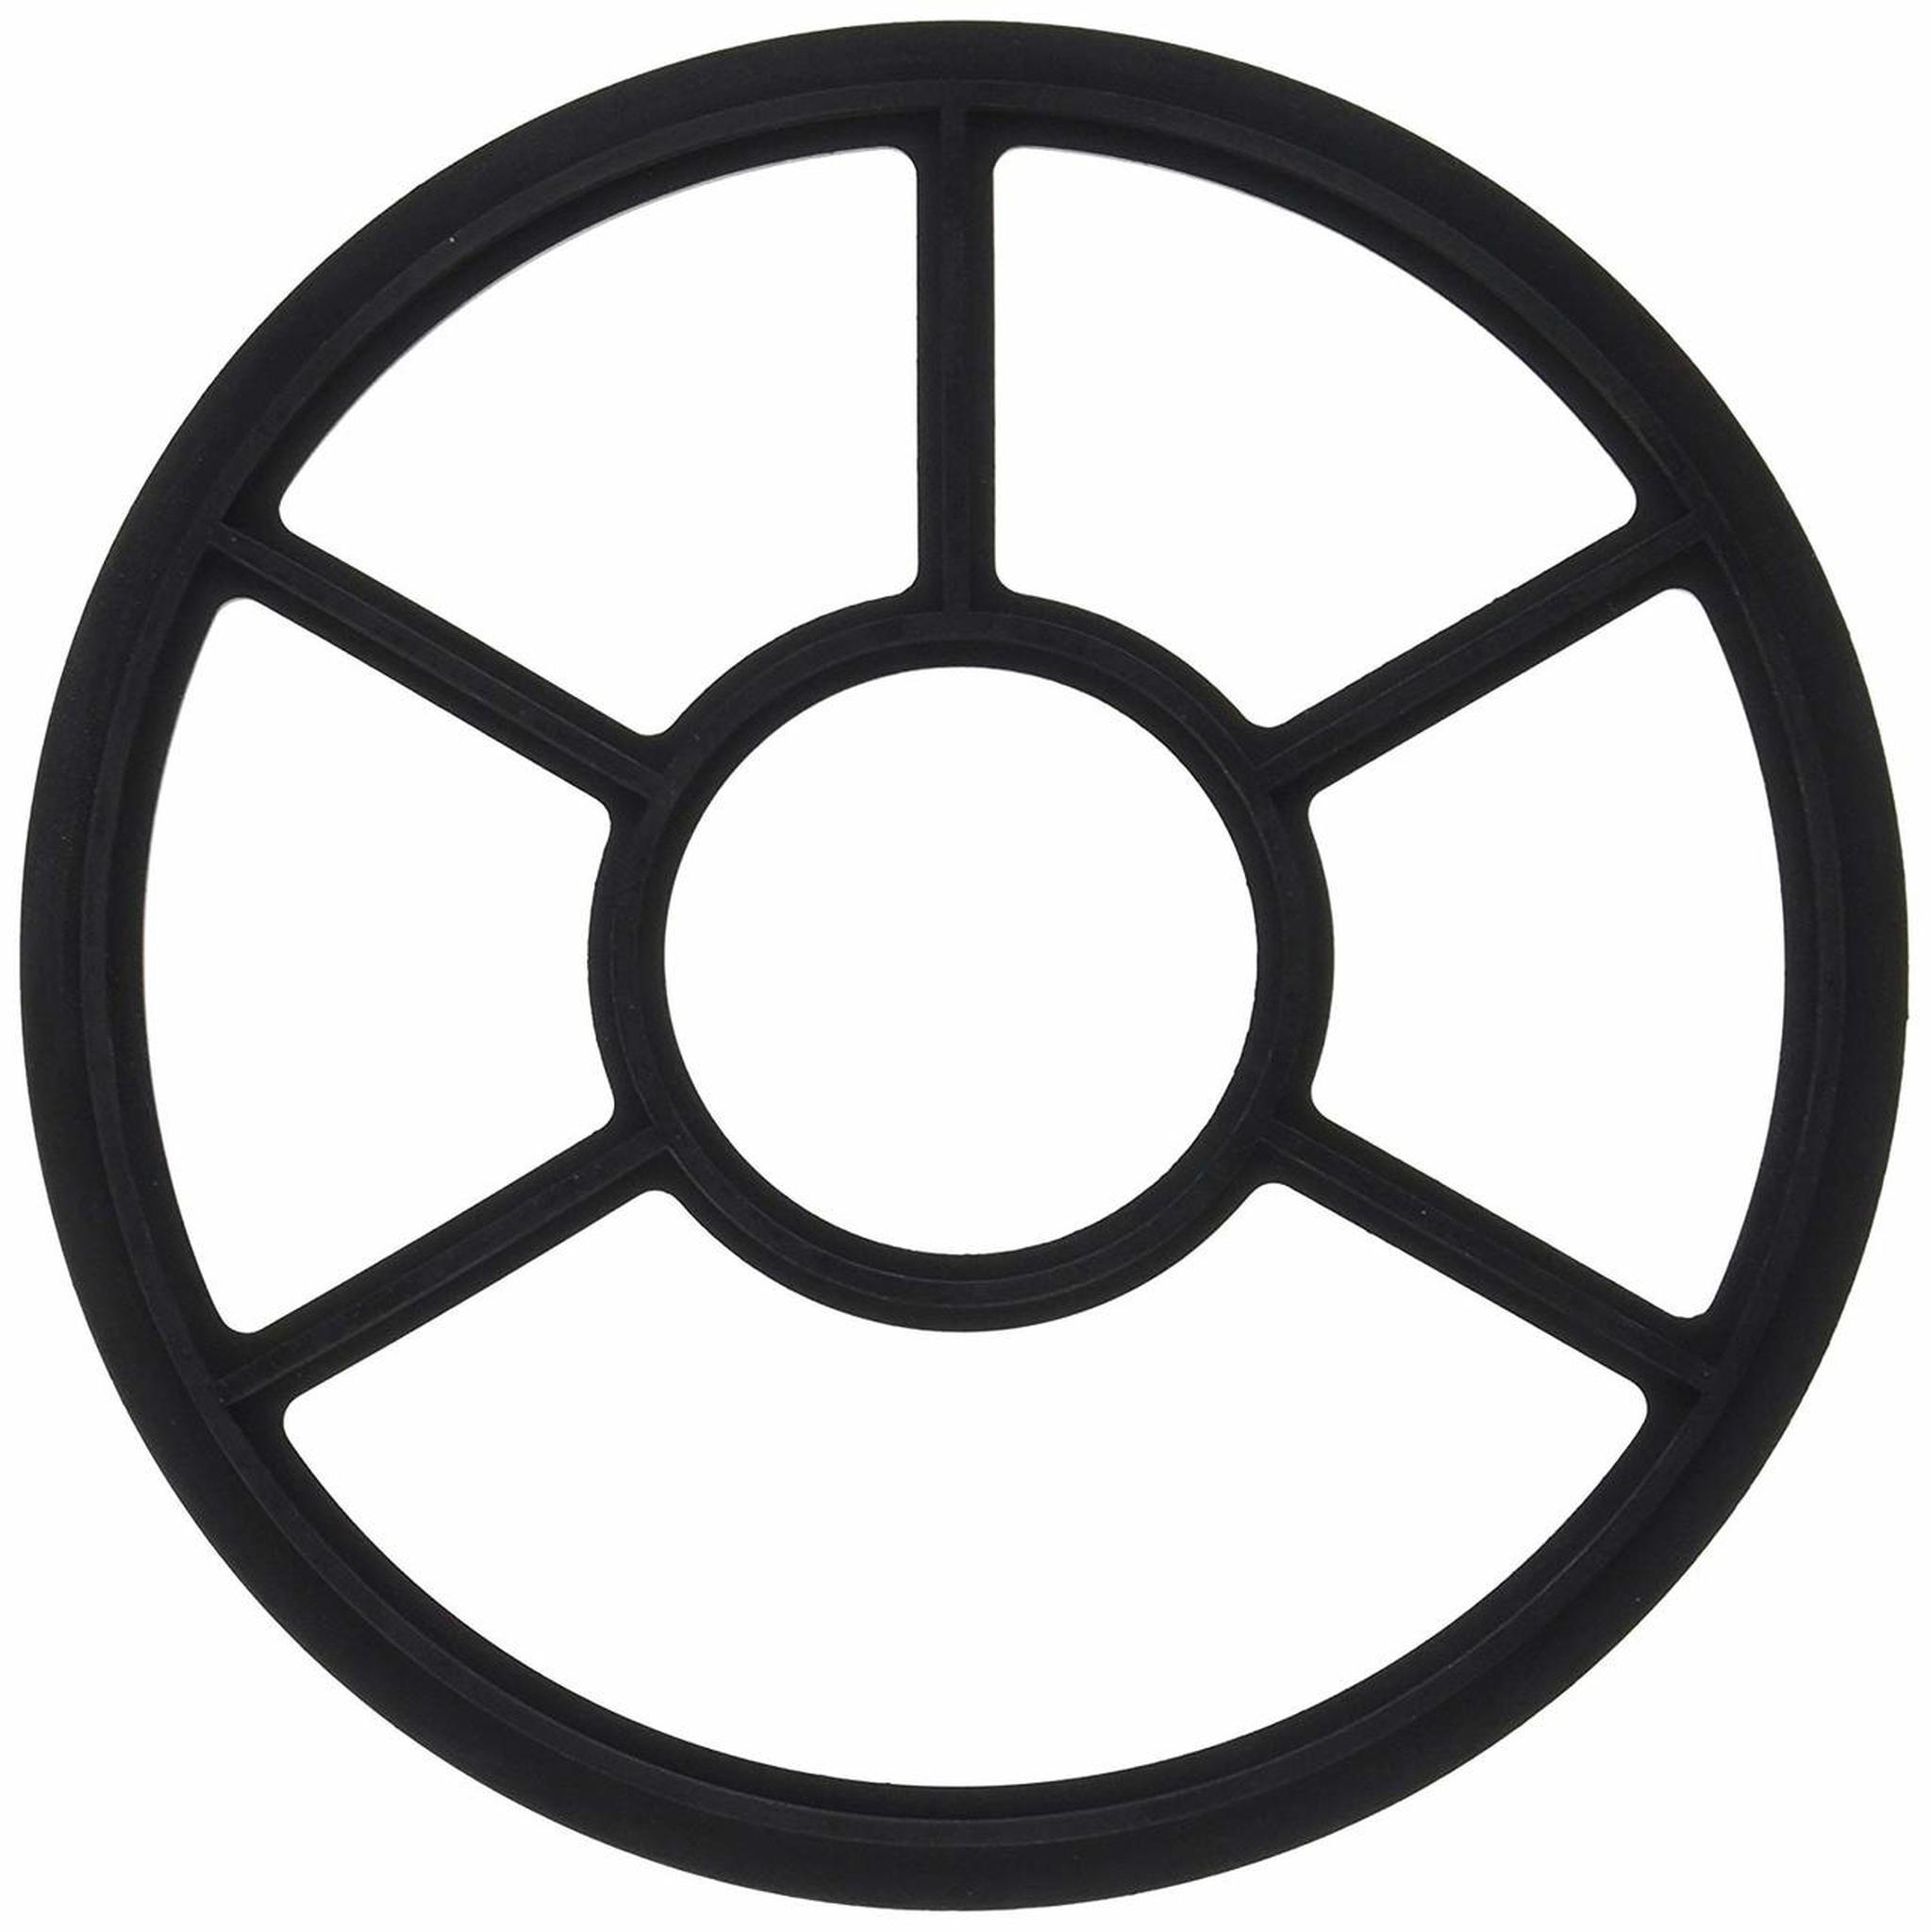 Pentair Multiport Valve Parts